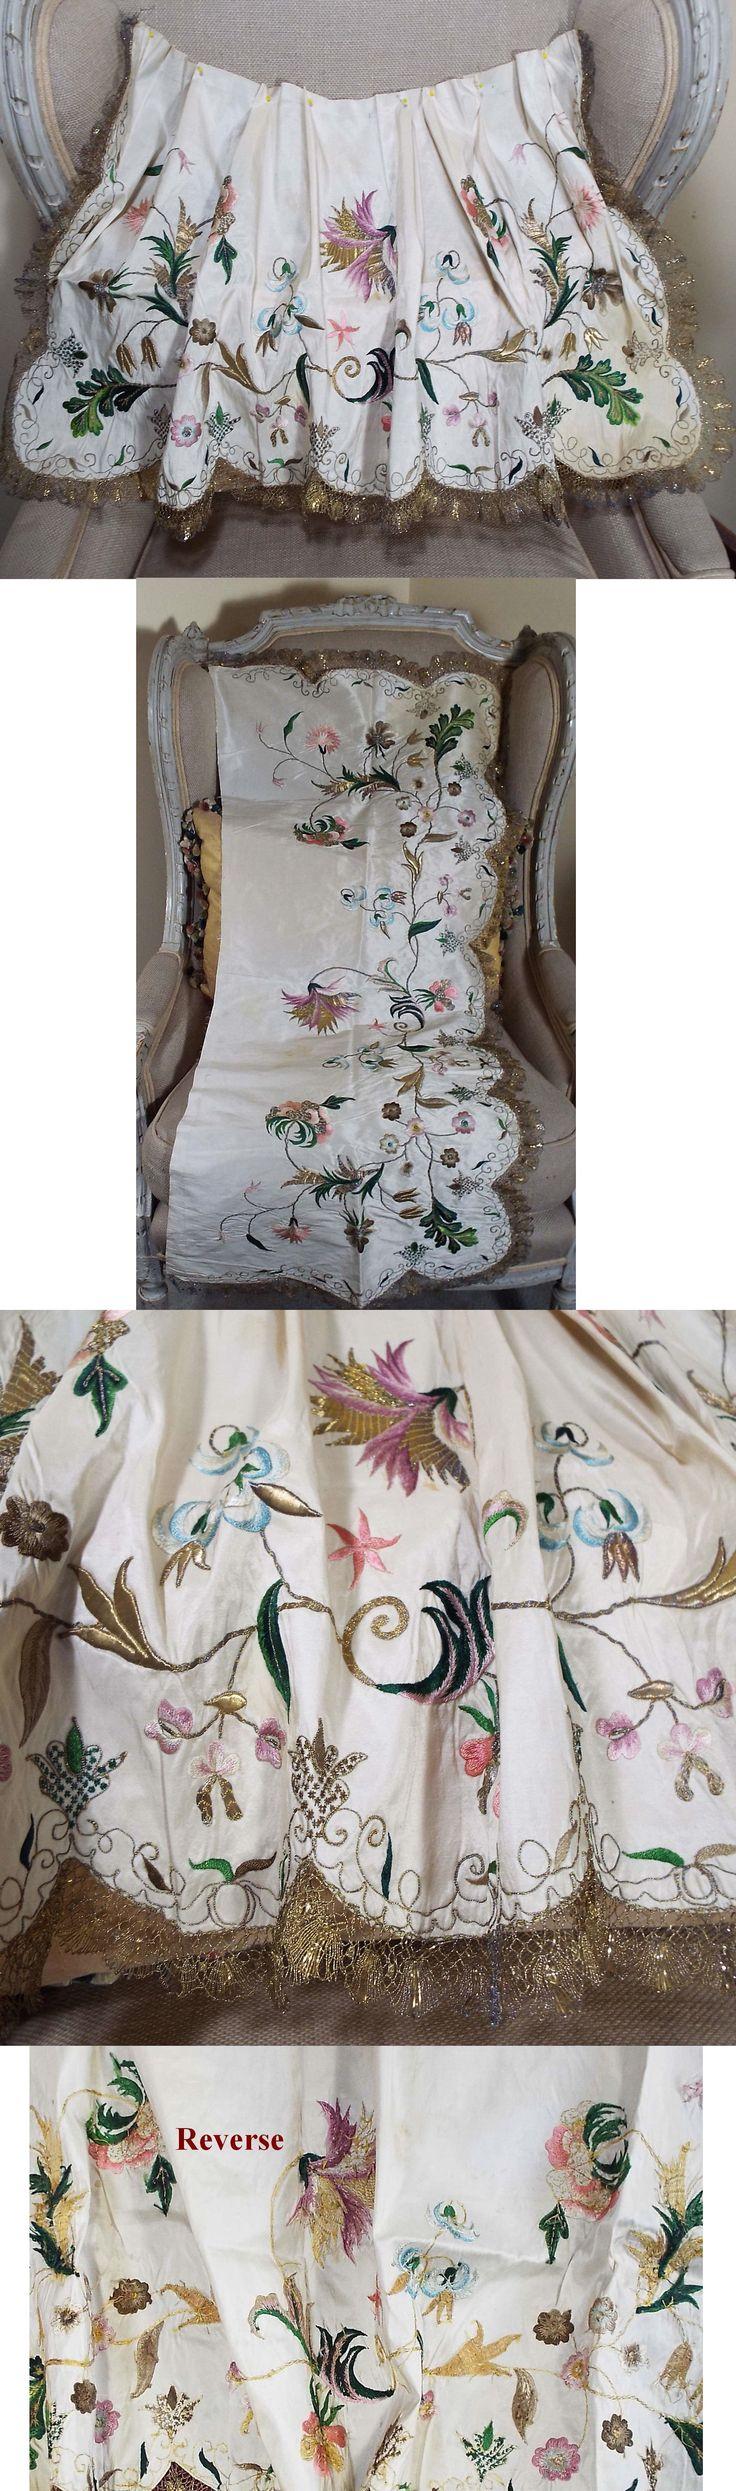 White pinafore apron ebay - Fancy Silk Apron With Embroidery And Metallic Lace Trim Circa 1730 1750 Via Ebay